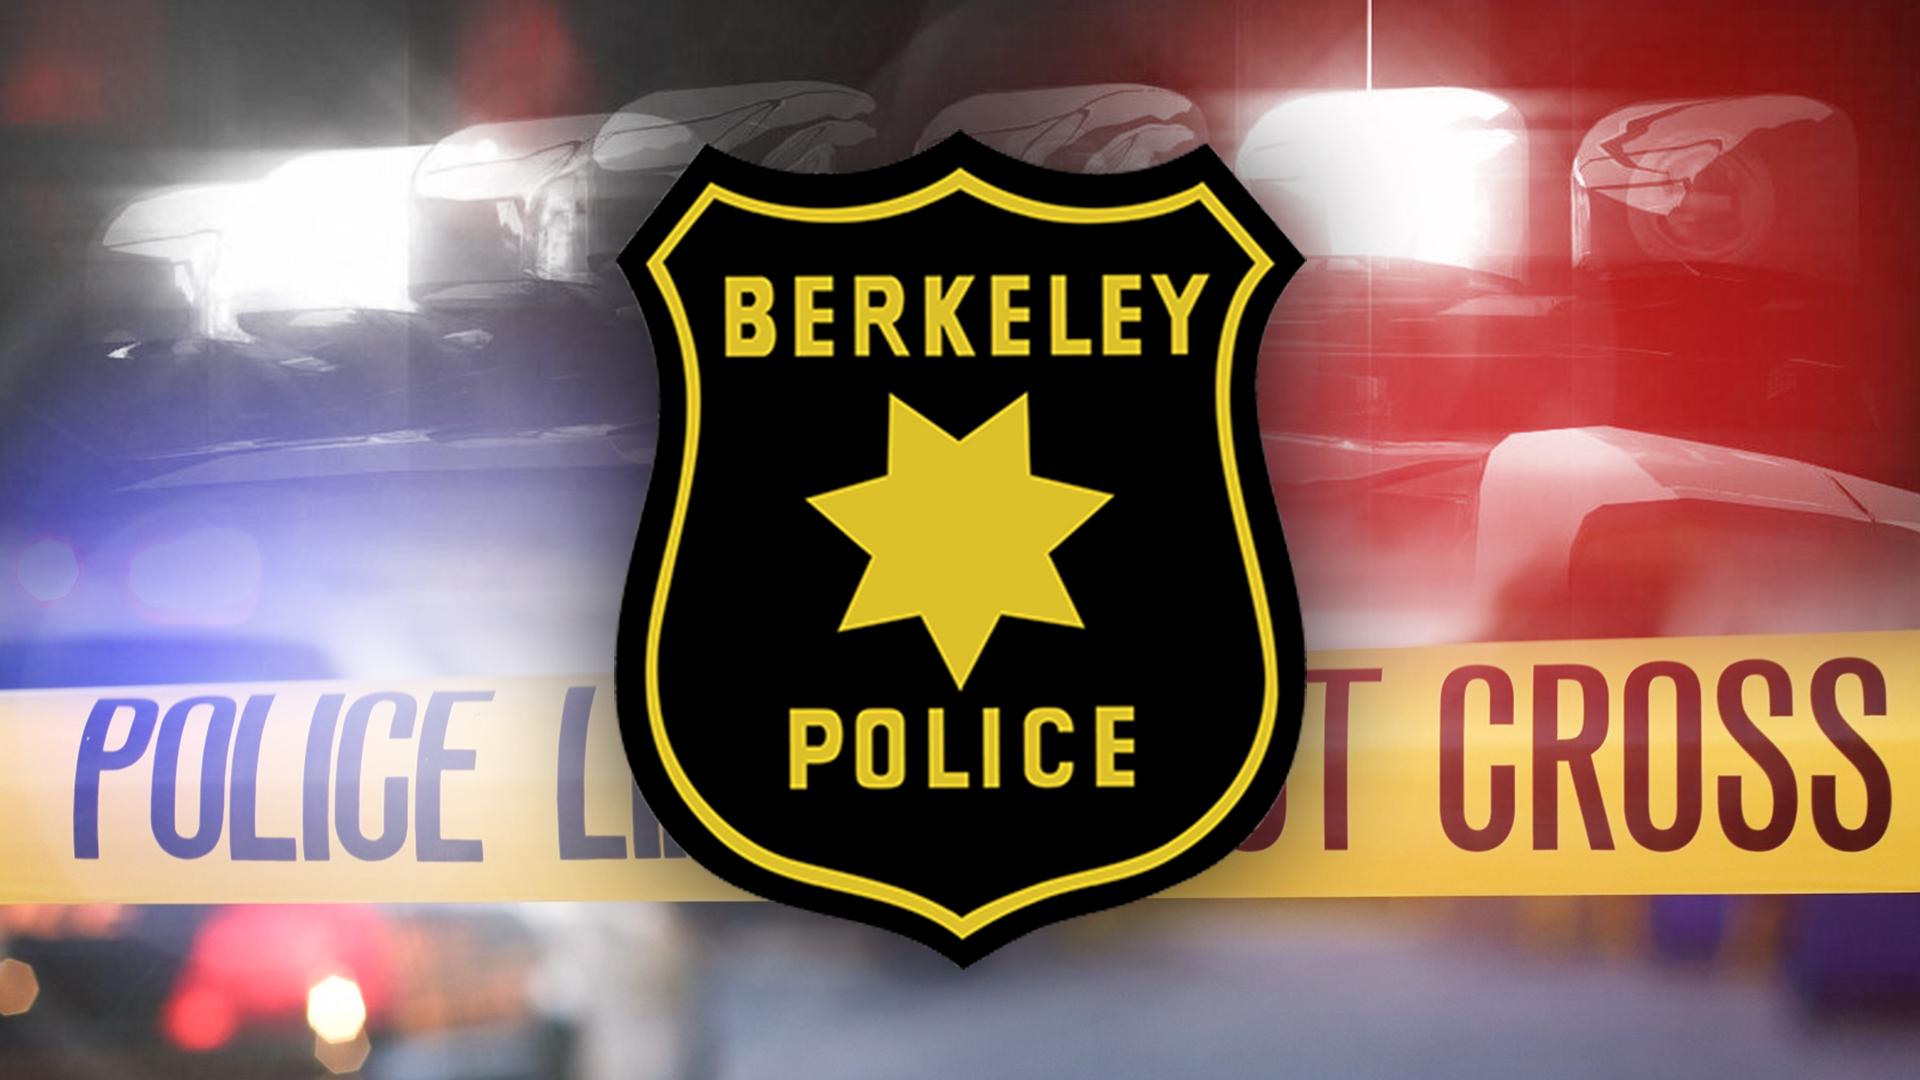 graphic FS Police Berkeley_1523150822587.jpg.jpg